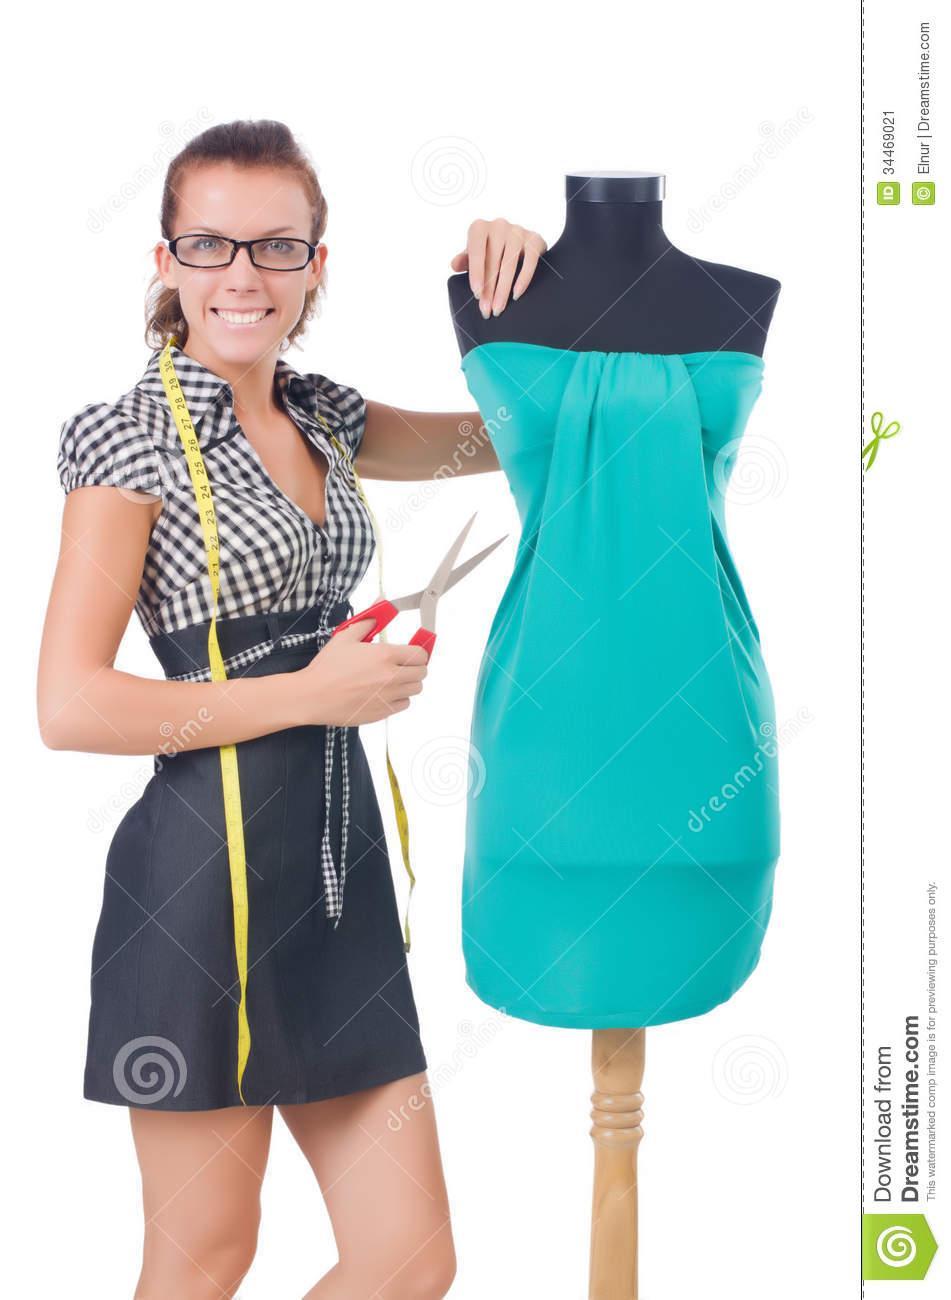 Women clipart tailor #8